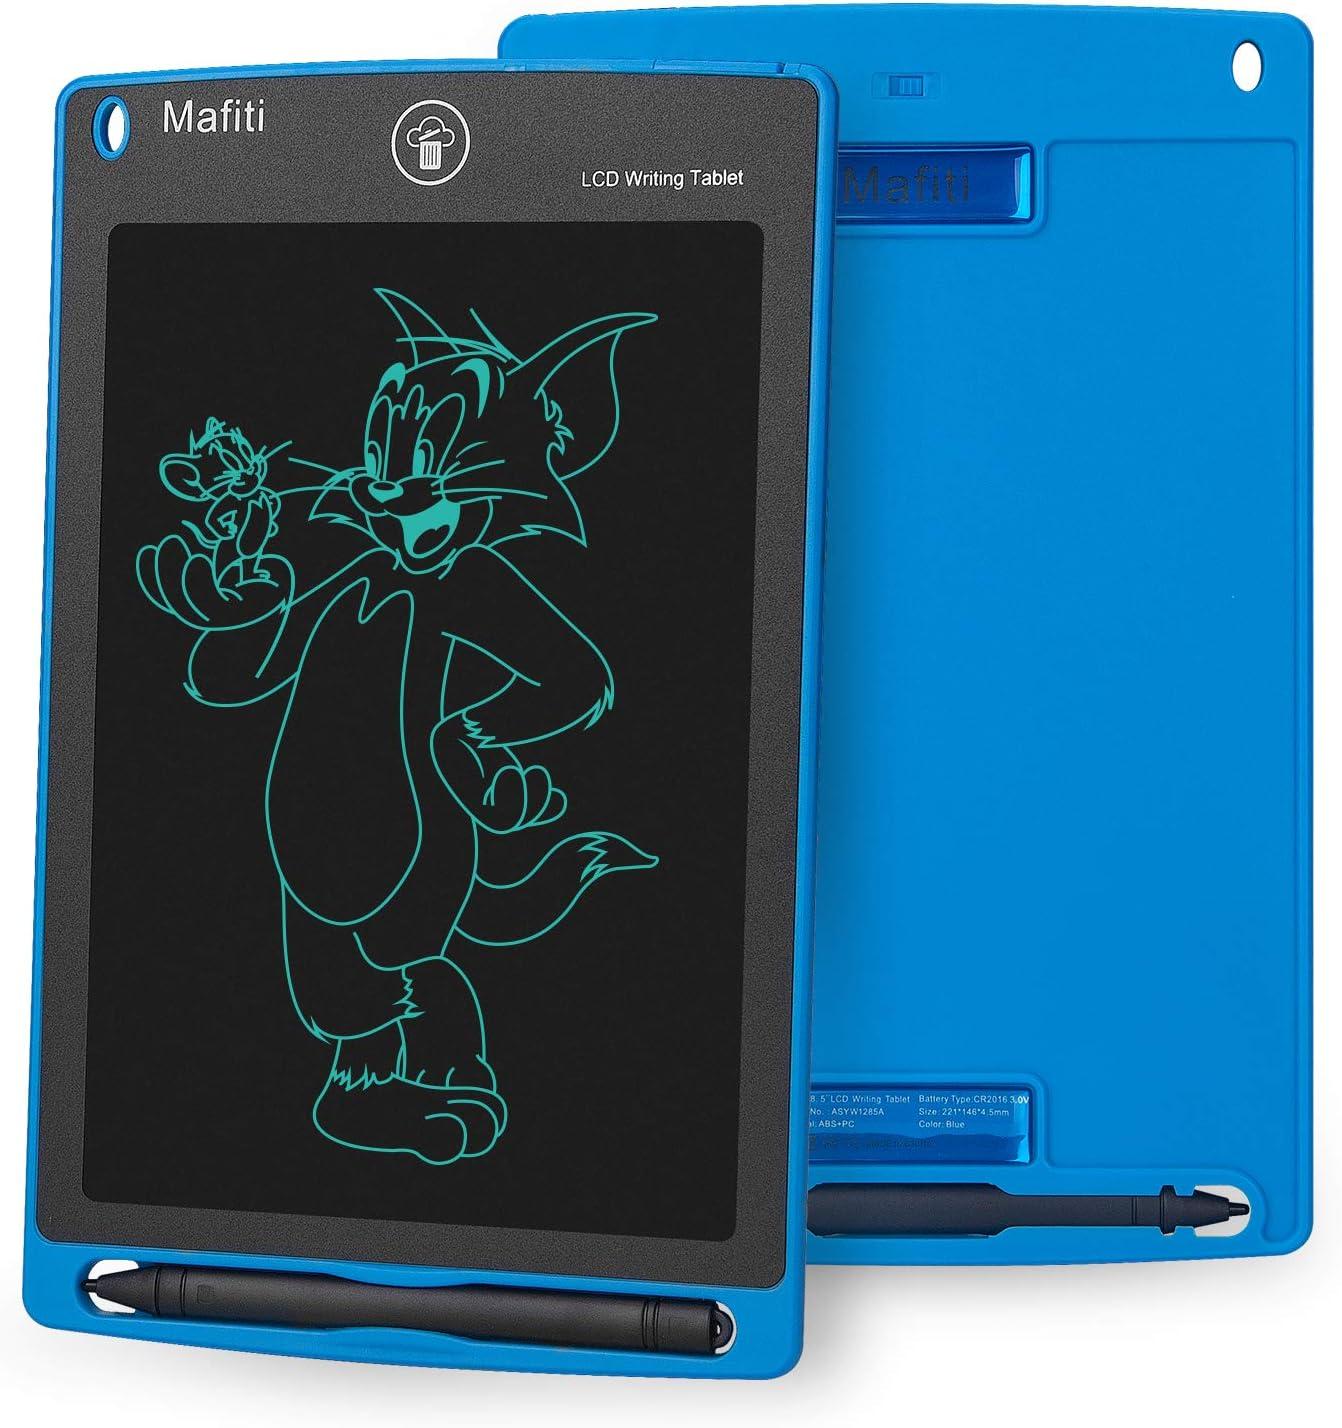 Mafiti 8,5 Pulgadas Tableta Gráfica, Tablets de Escritura LCD, Portátil Tableta de Dibujo Adecuada para el hogar, Escuela, Oficina